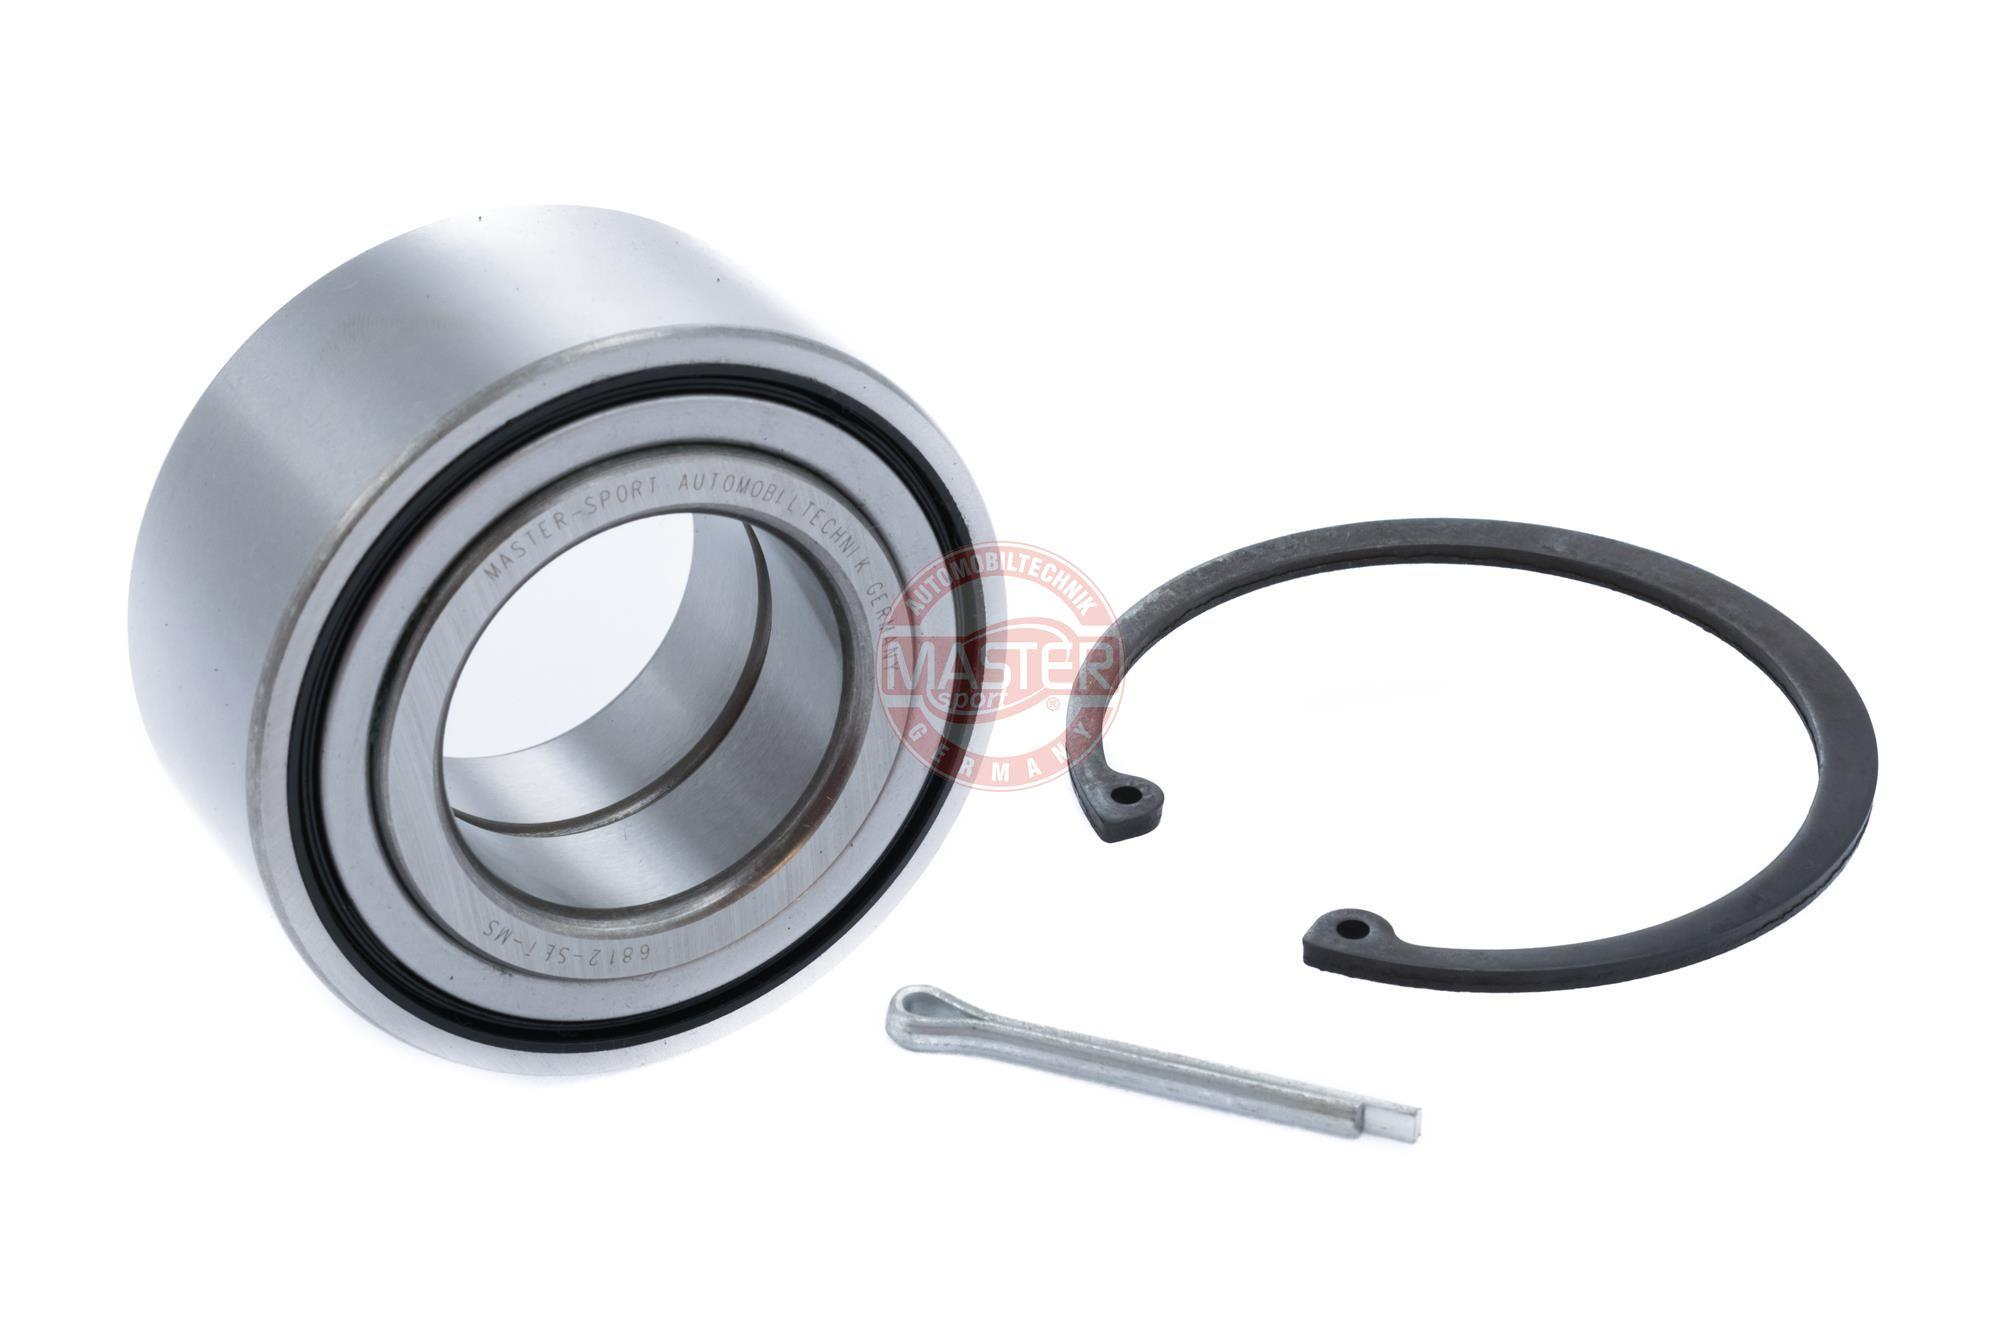 Wheel Hub Bearing 6812-SET-MS MASTER-SPORT 190068121 original quality